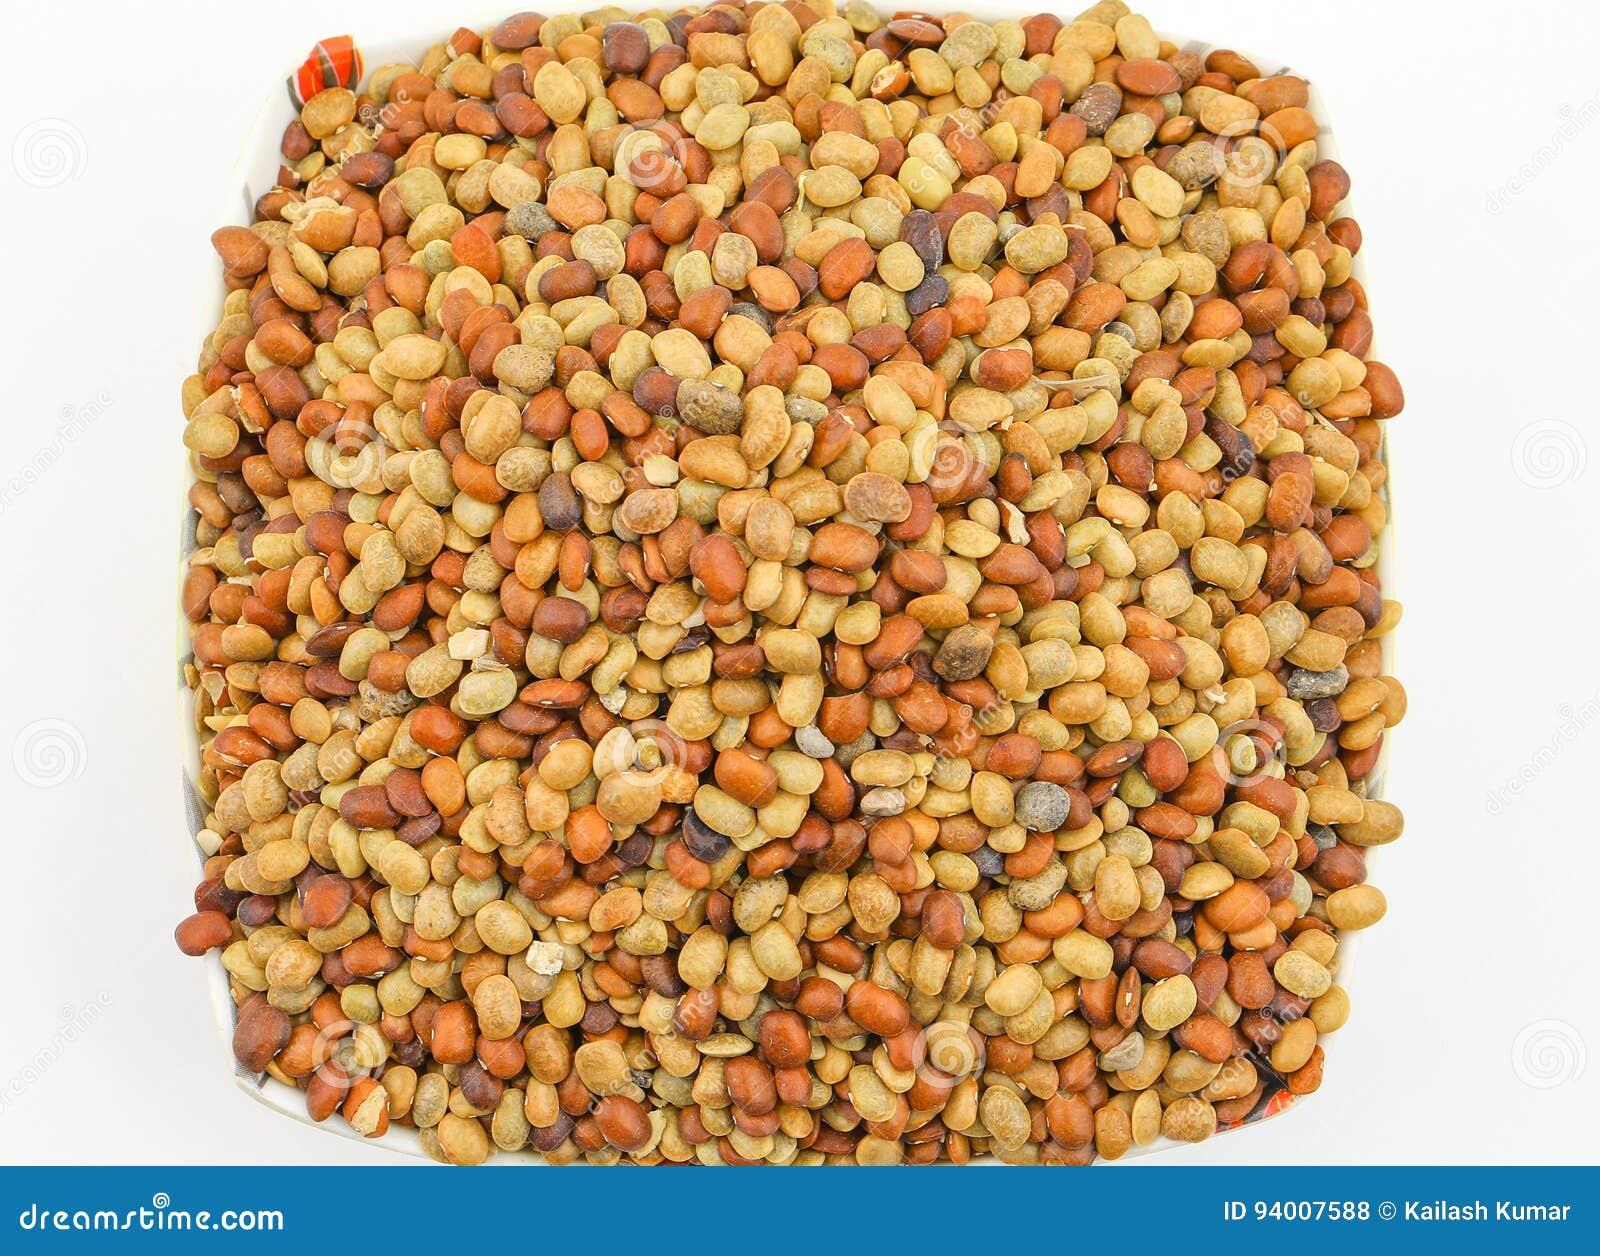 Karat seeds stock photo  Image of kalt, isolate, diet - 94007588